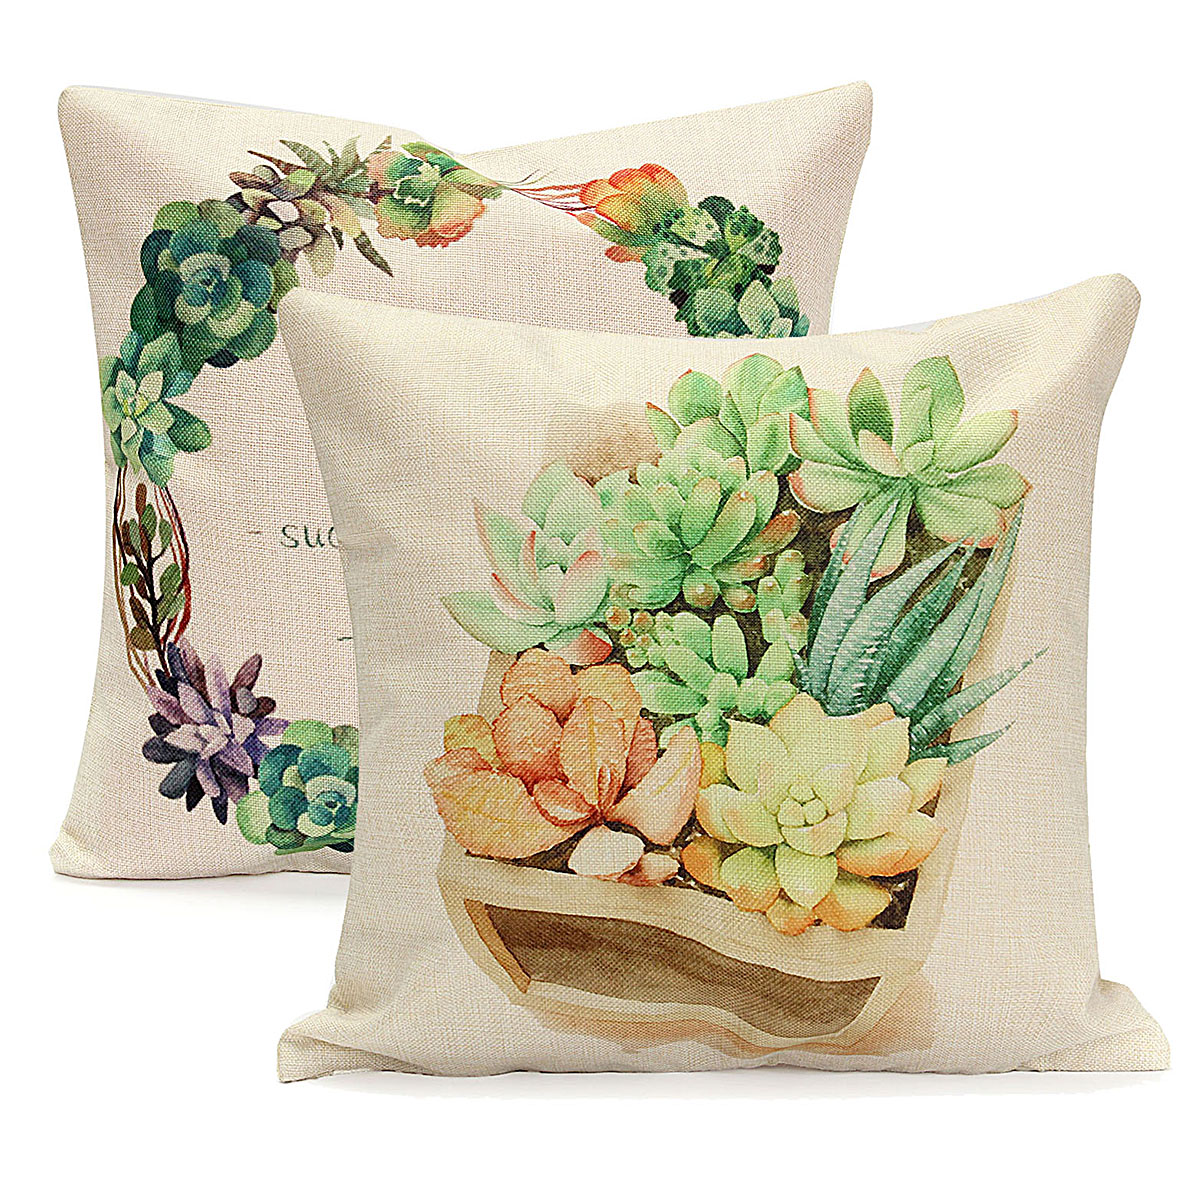 Meigar Tropical Cactus Throw Pillow Cushion Cover 18''x18'' Cotton Linen Standard Back Waist Decorative Pillowcase Pillowslip Pillow Protector Case for Sofa Couch Chair Car Seat,Succulent Plant color